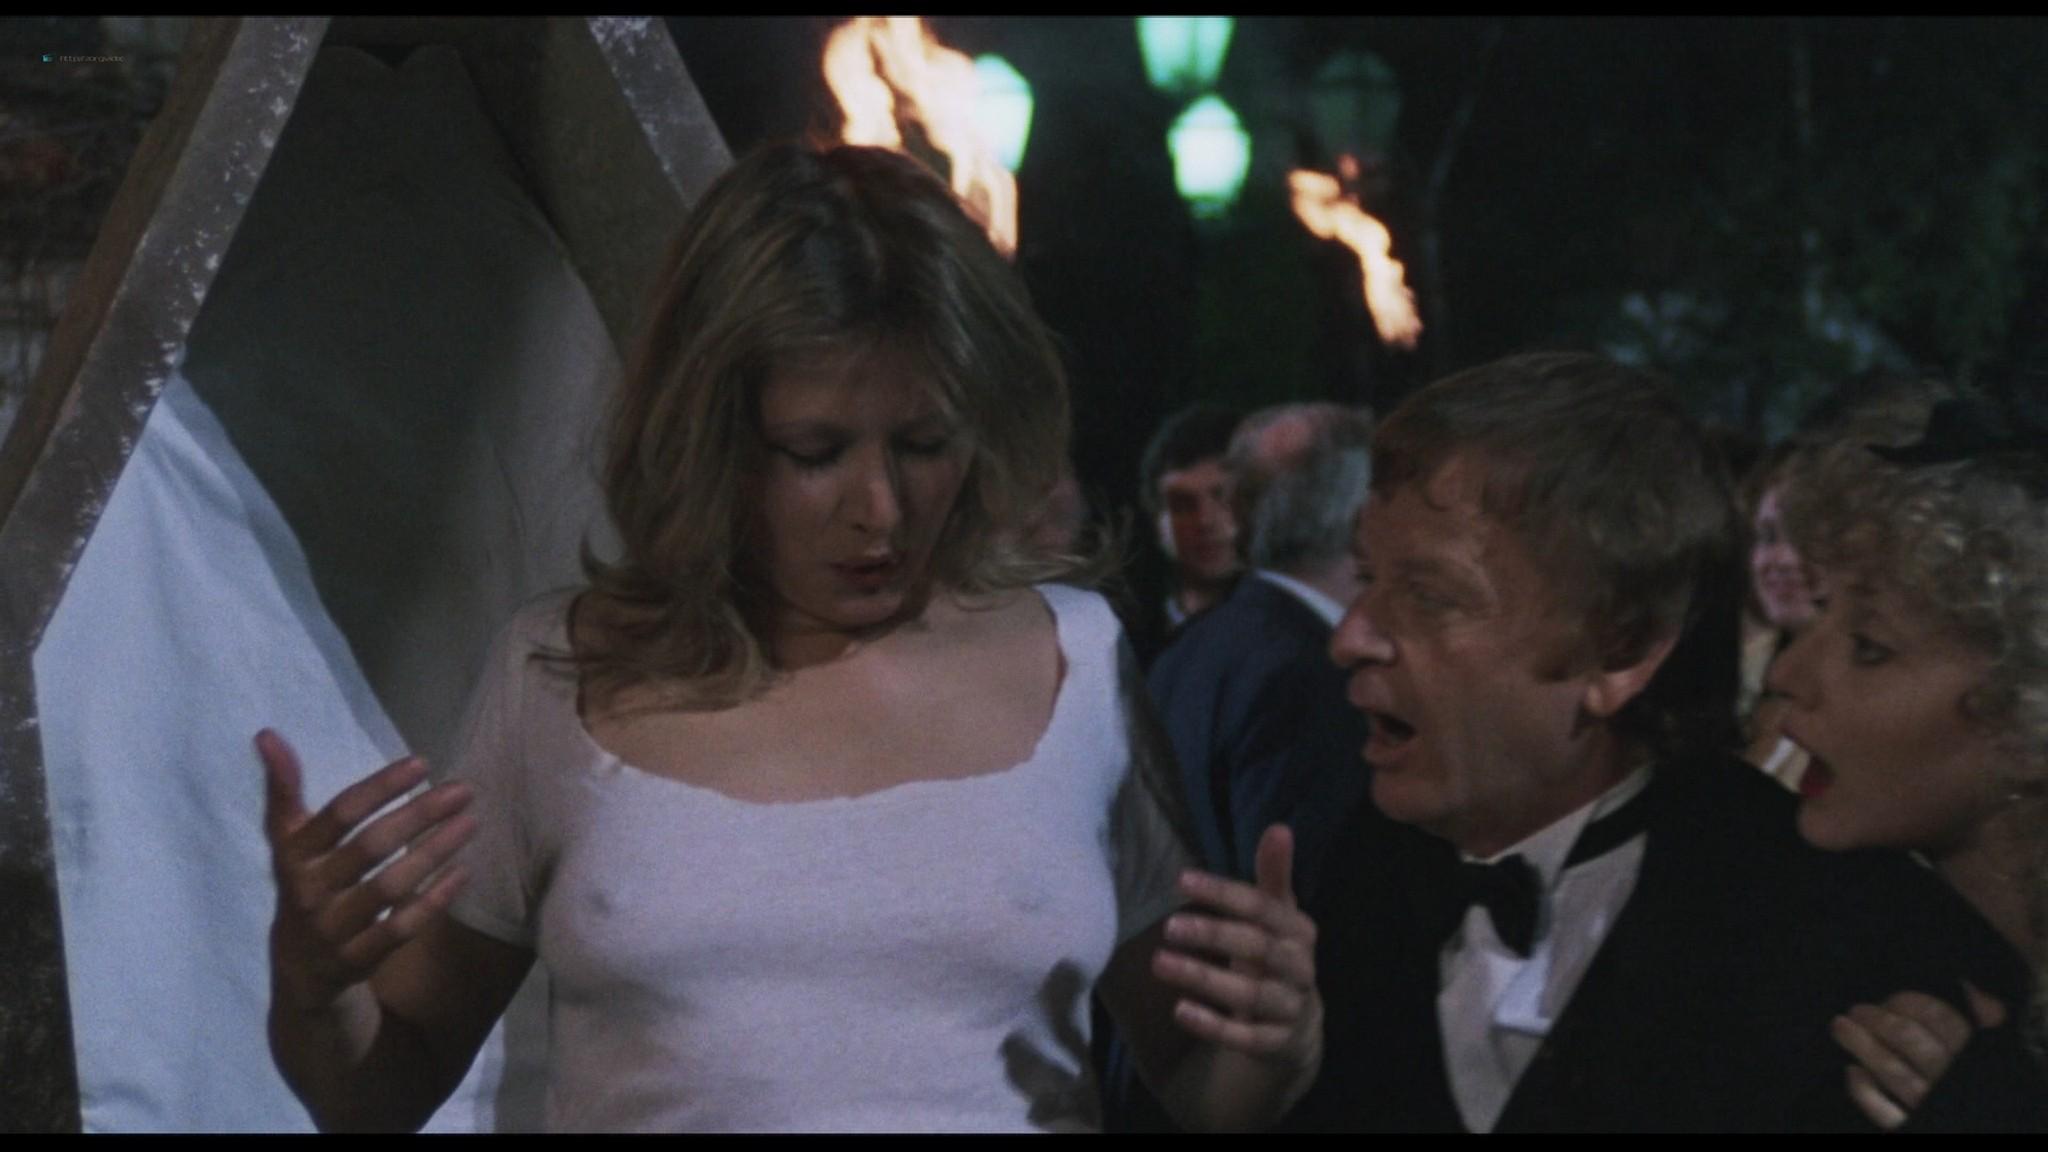 Geena Davis hot and sexy Ksenia Prohaska sexy - Transylvania 6-5000 (1985) HD 1080p BluRay (4)